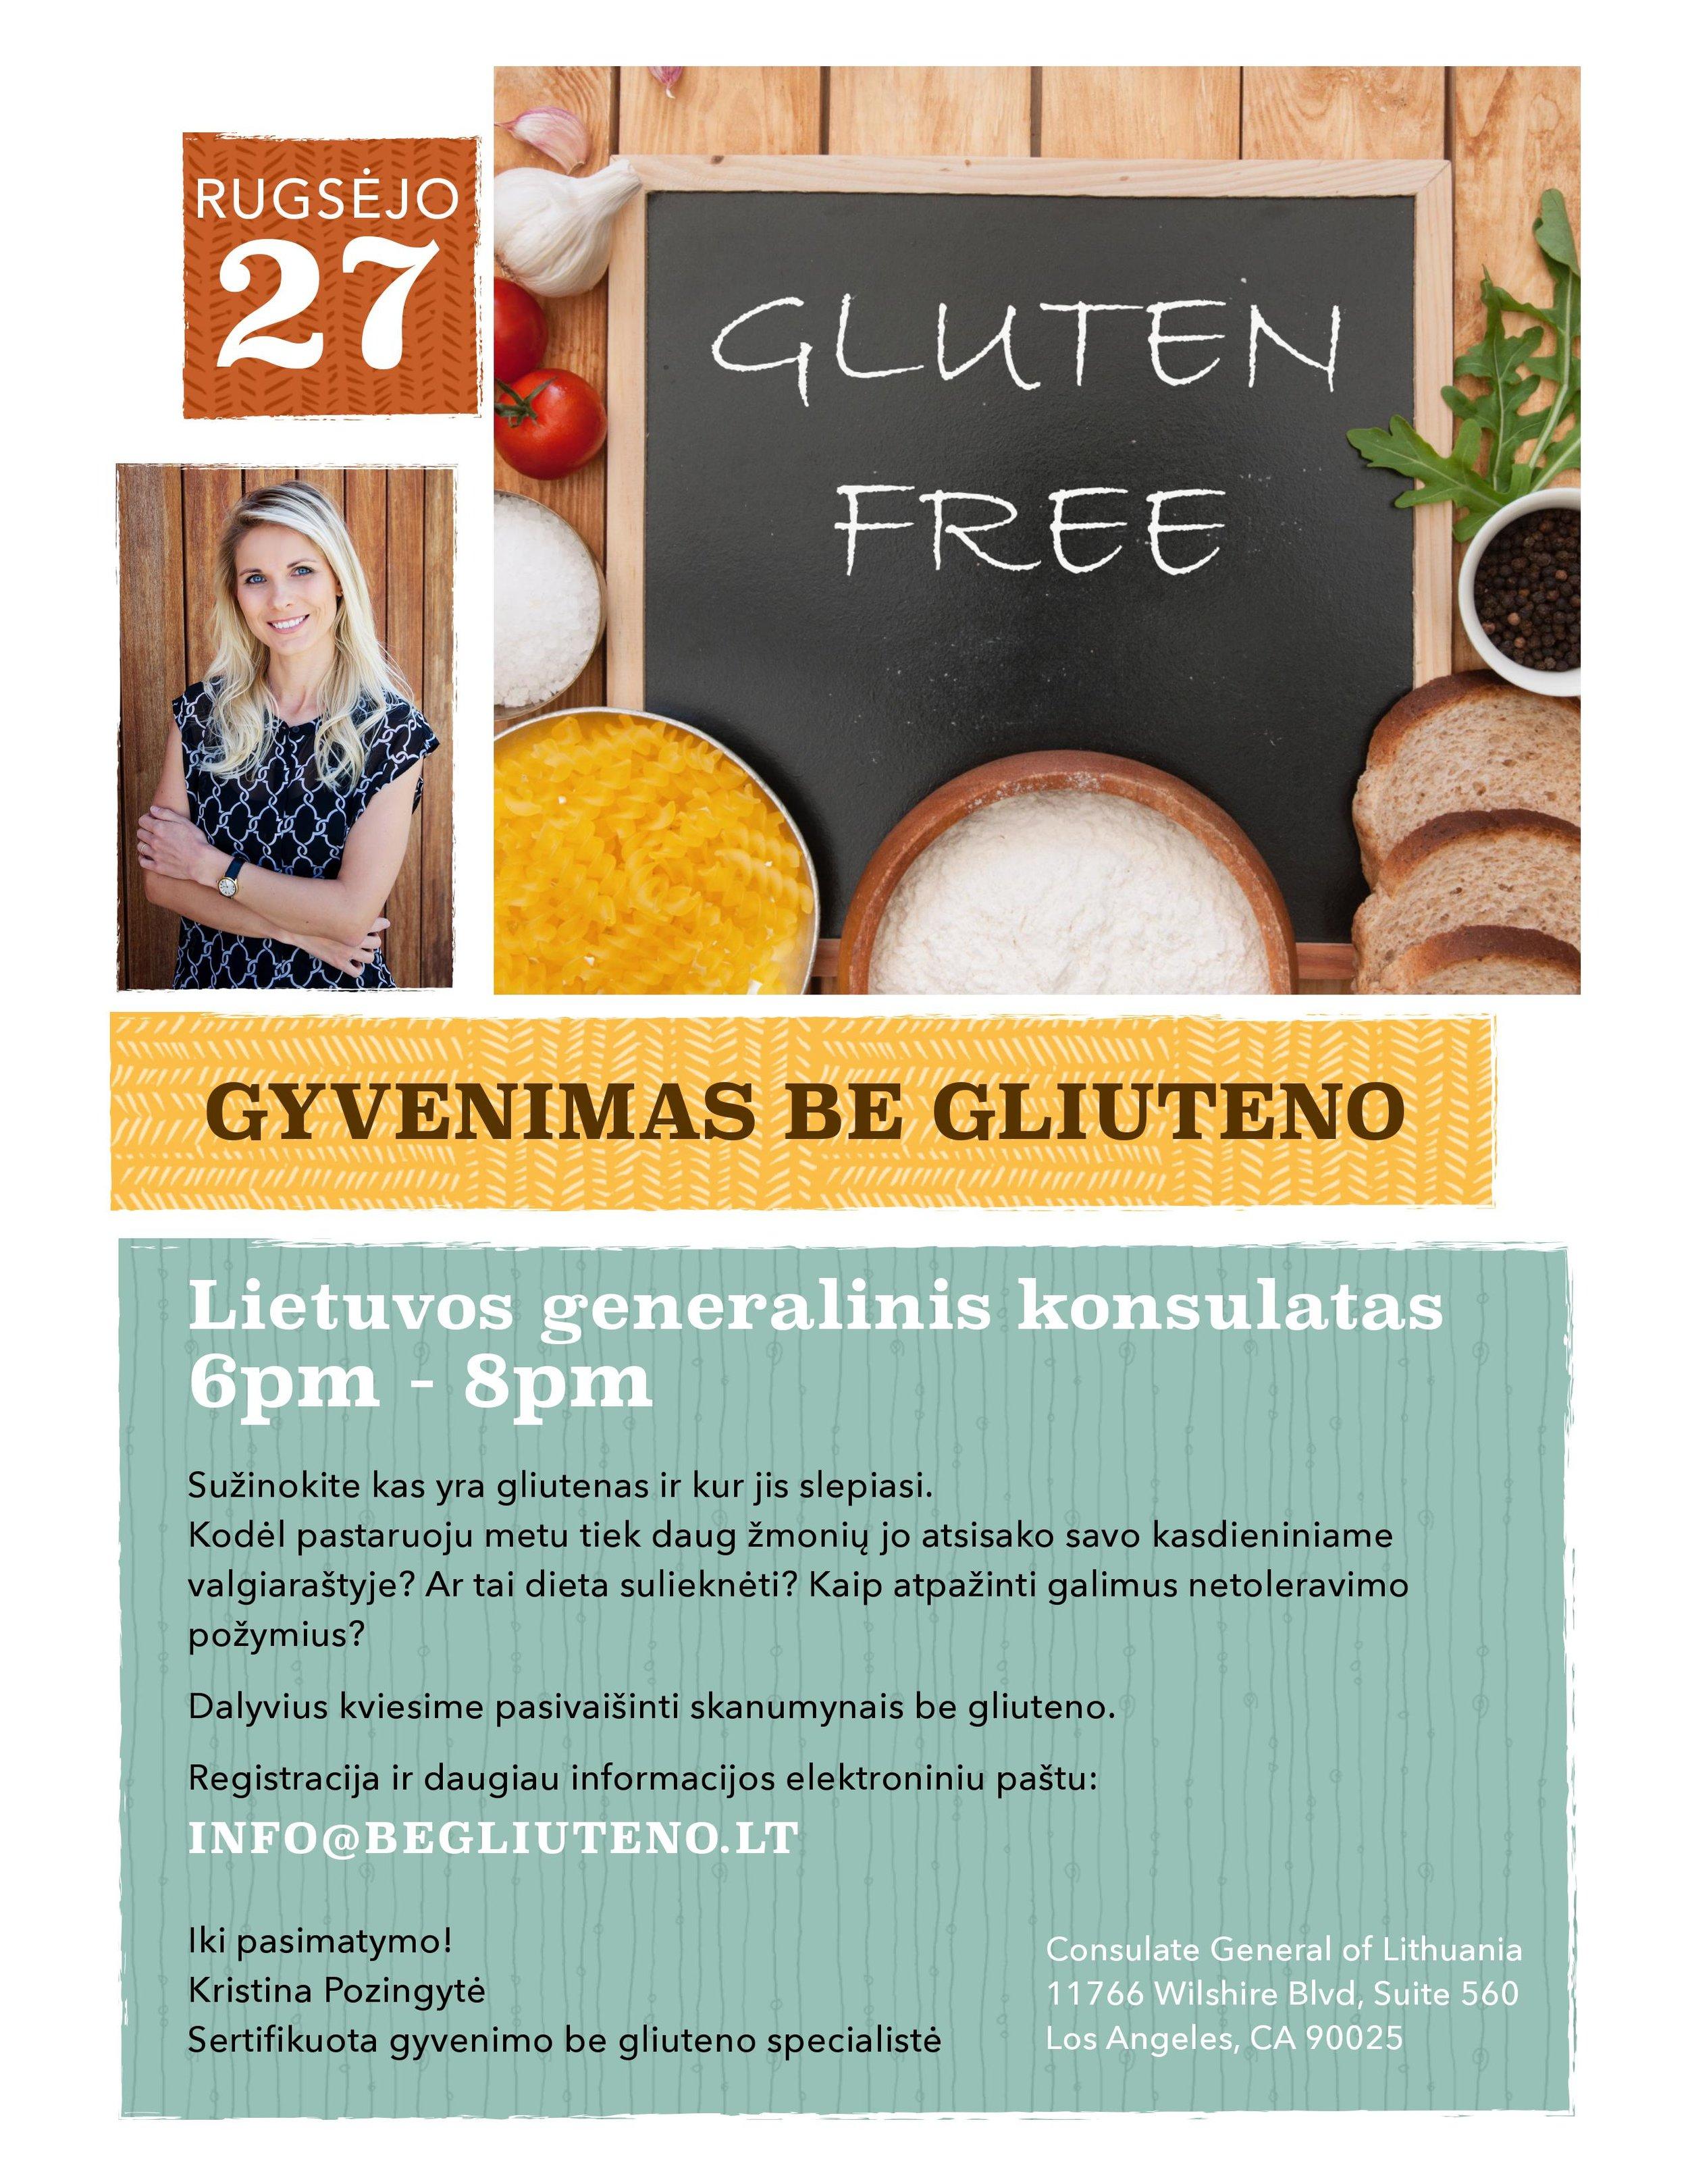 Gluten free event Los Angeles.jpg